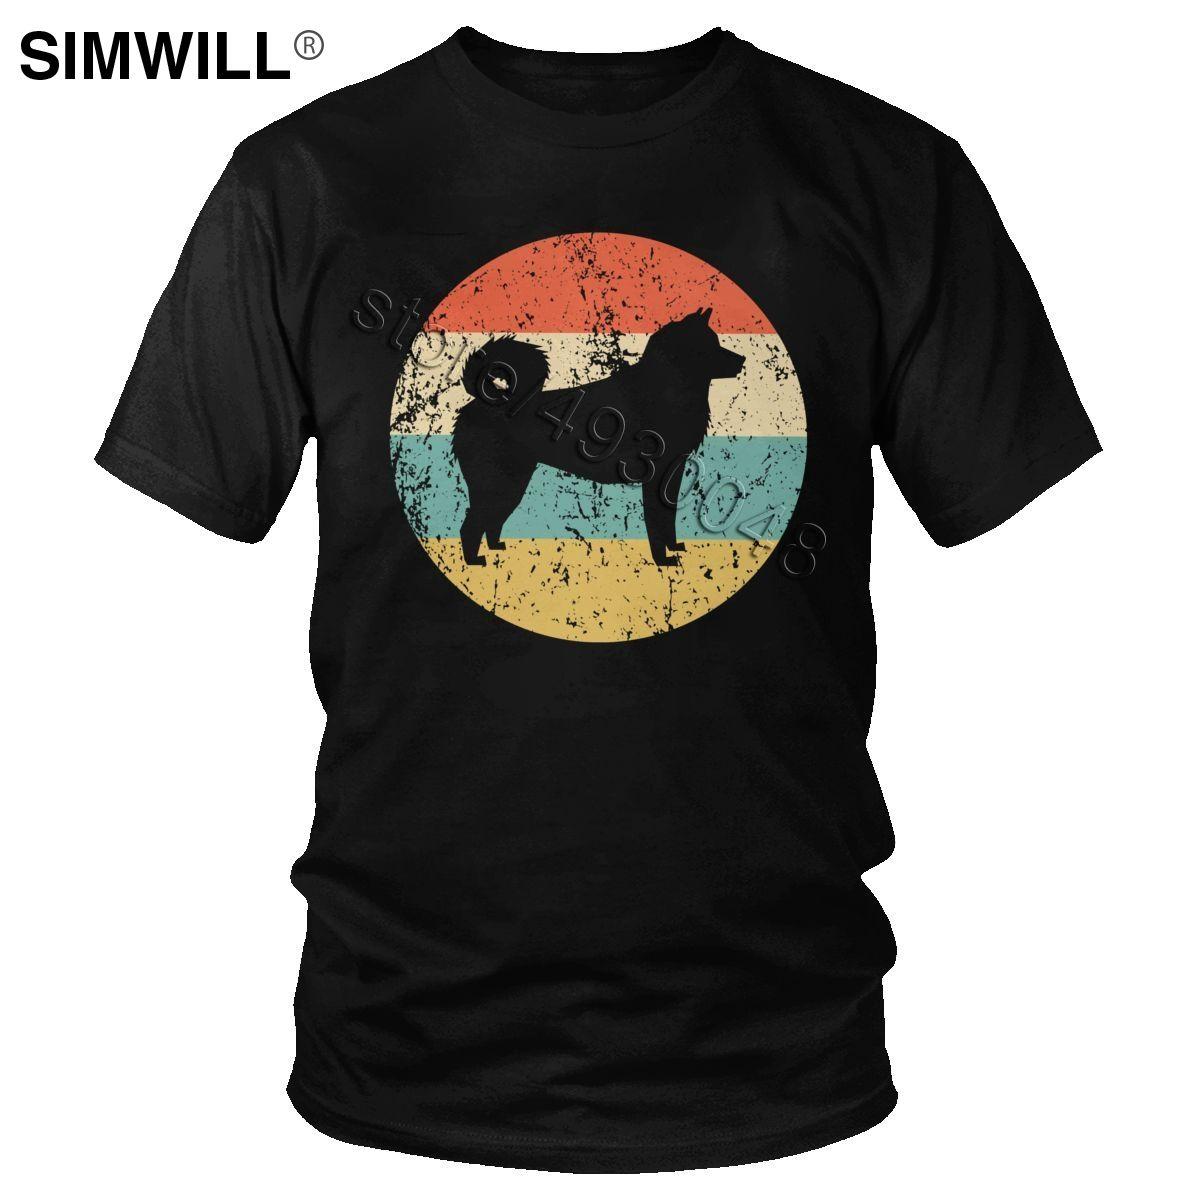 Sommer Neuestes T-Shirt Men Cotton Vintage-Akita Inu T-Shirt Kurzarm japanische Akiat T-Shirt Hundebesitzer Geschenk Männlich Kleidung T